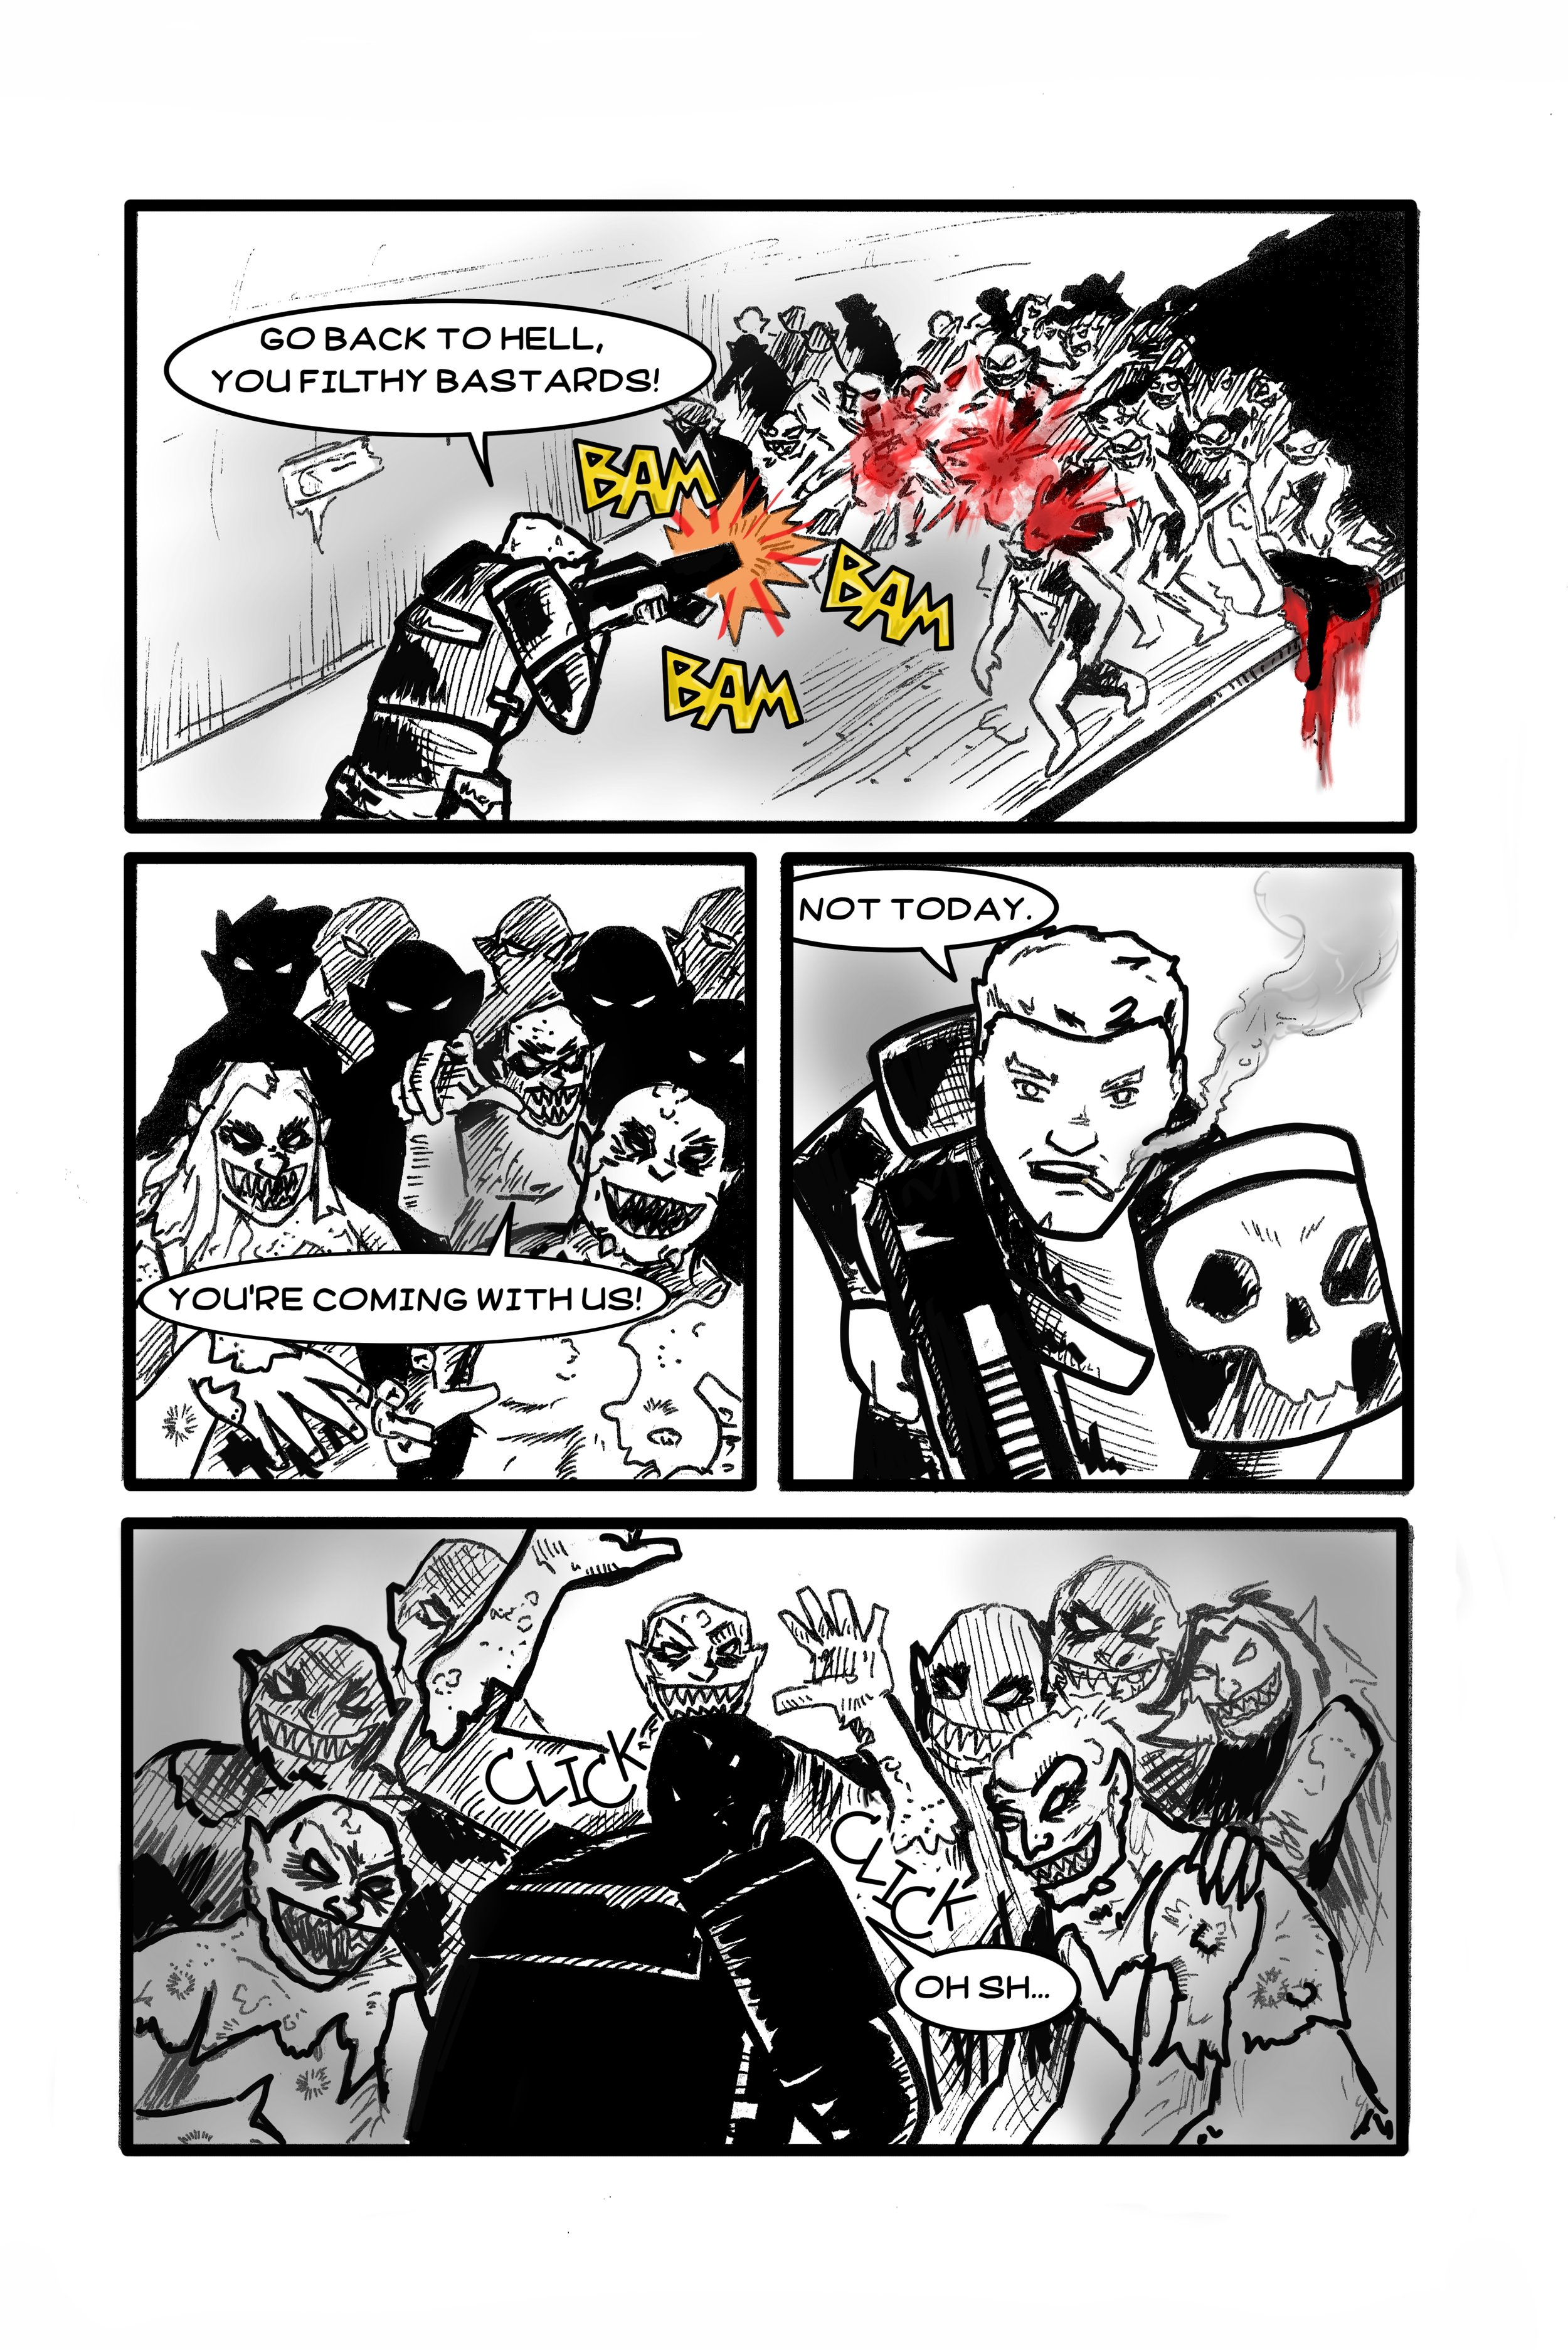 twh page11.jpg